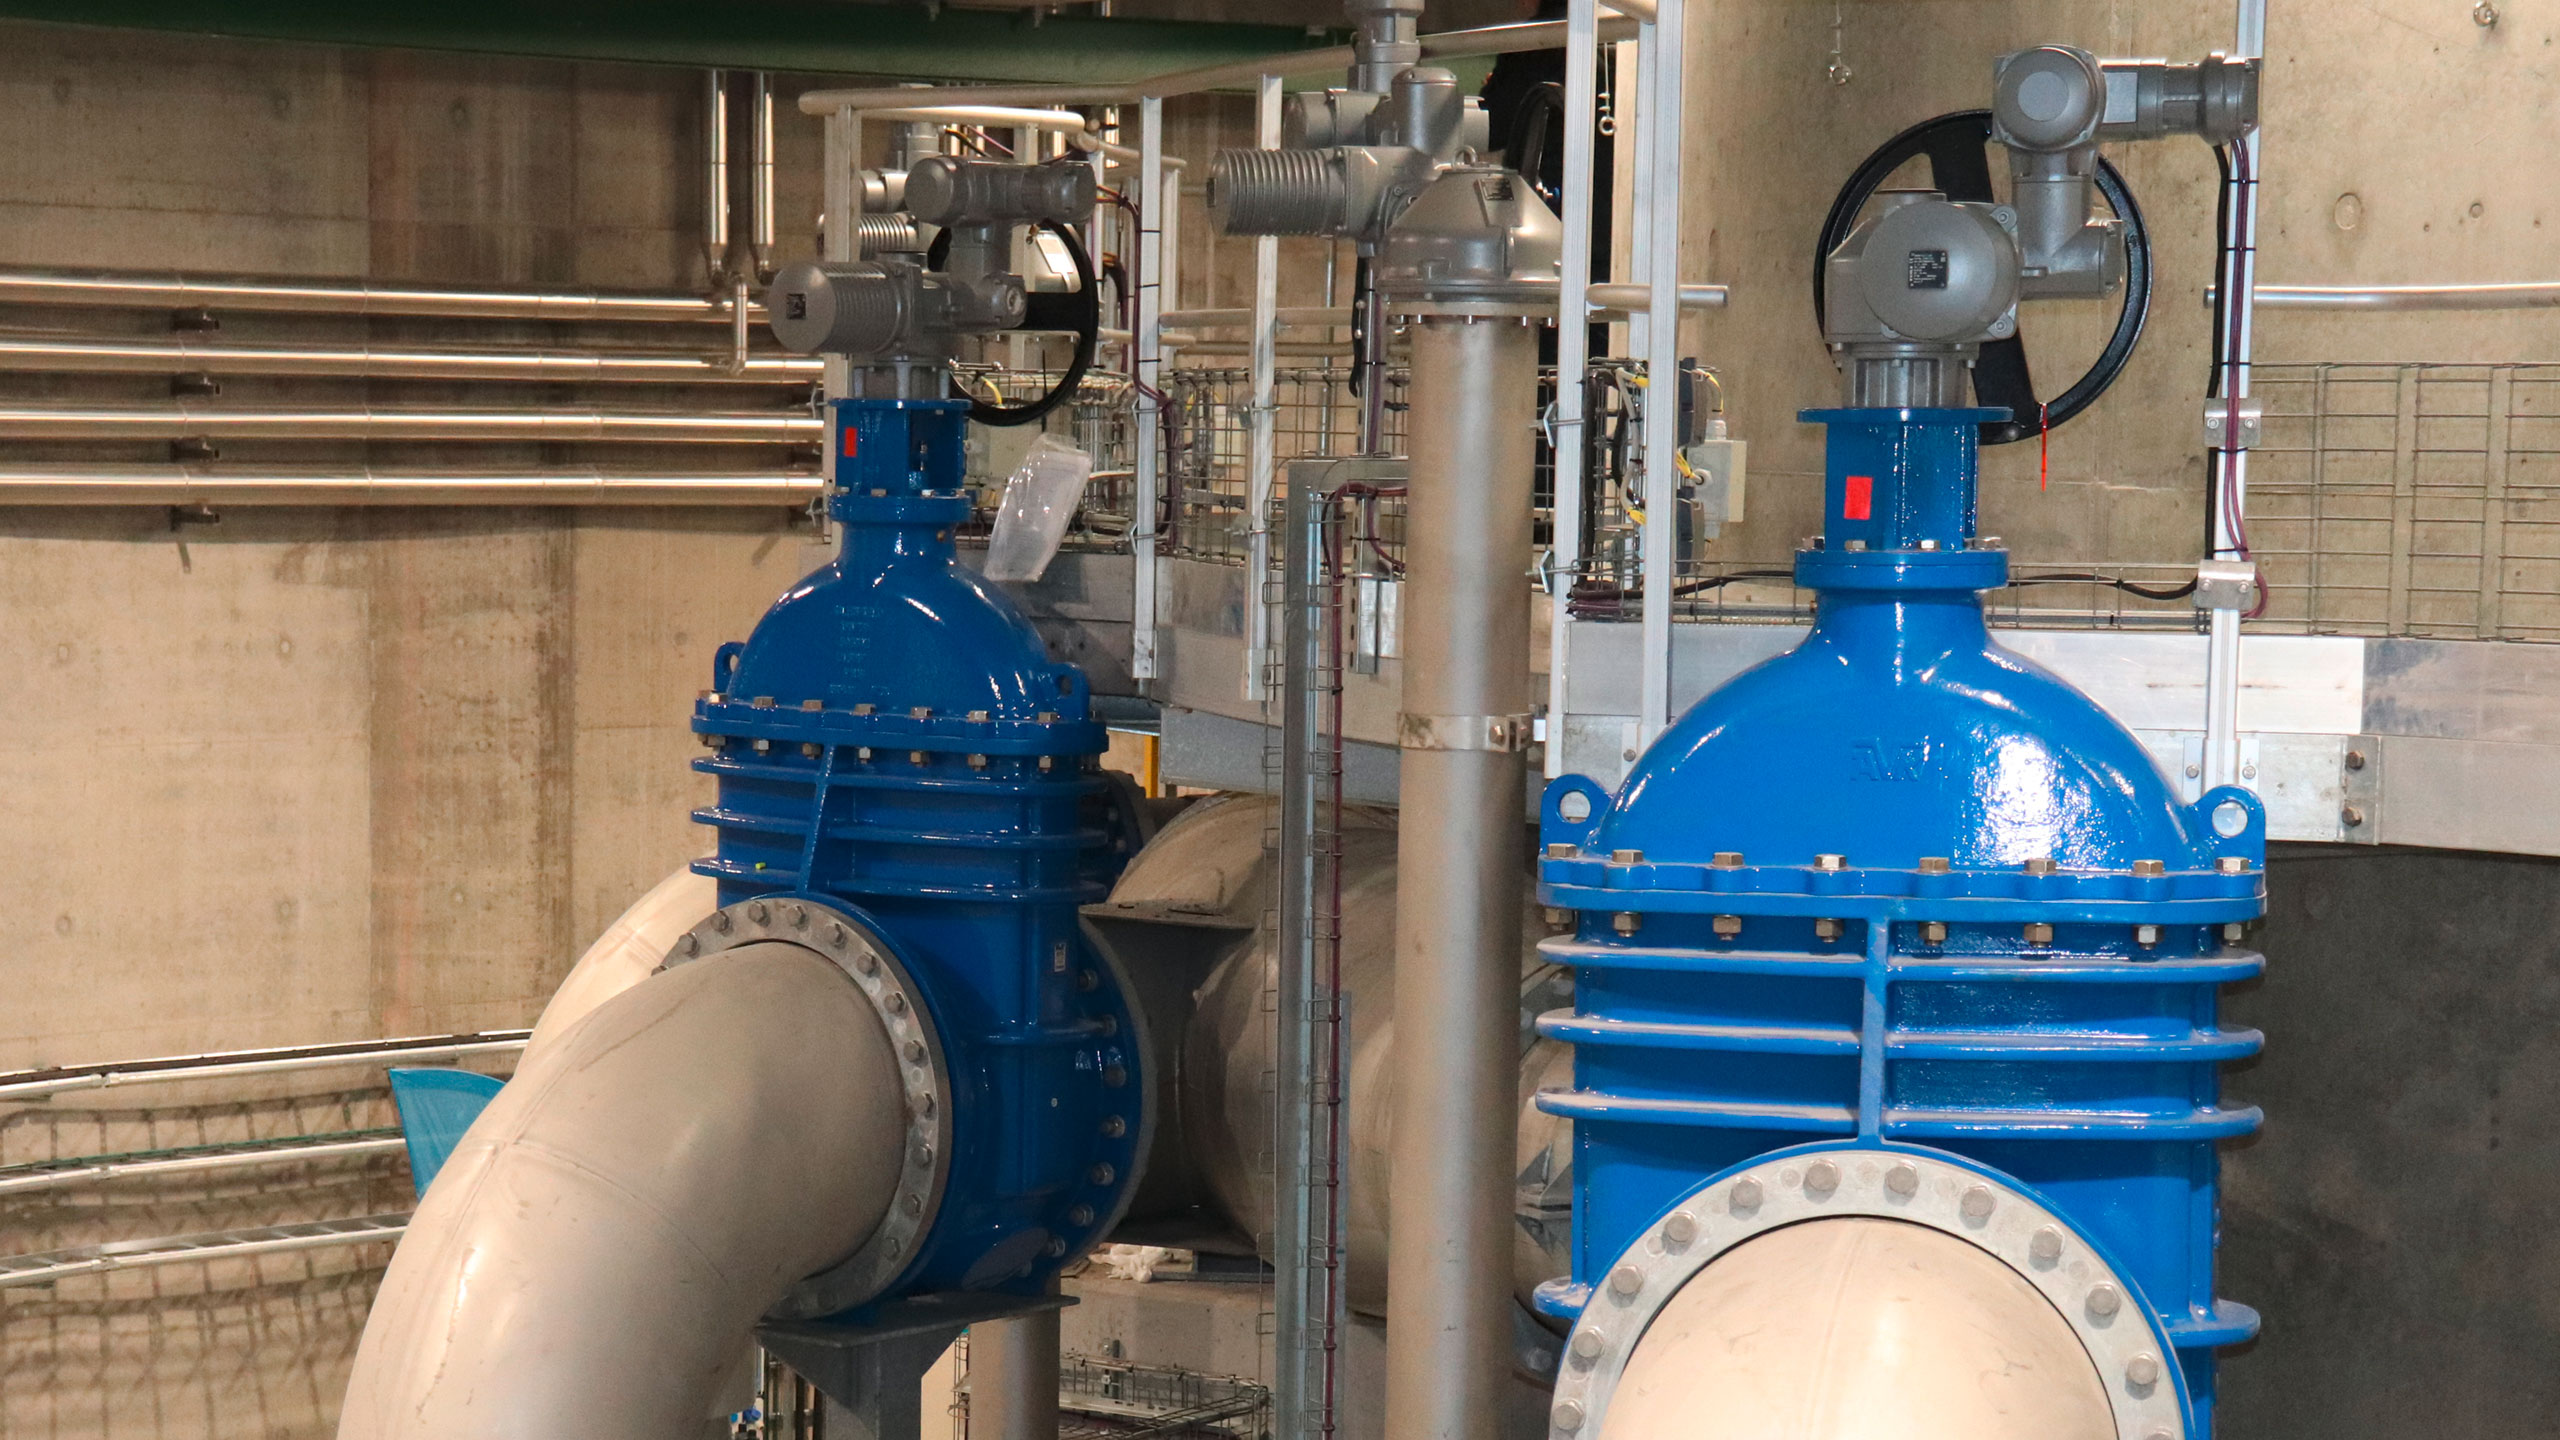 AVK-ventiler installeret på Kløvermarken Pumpestation